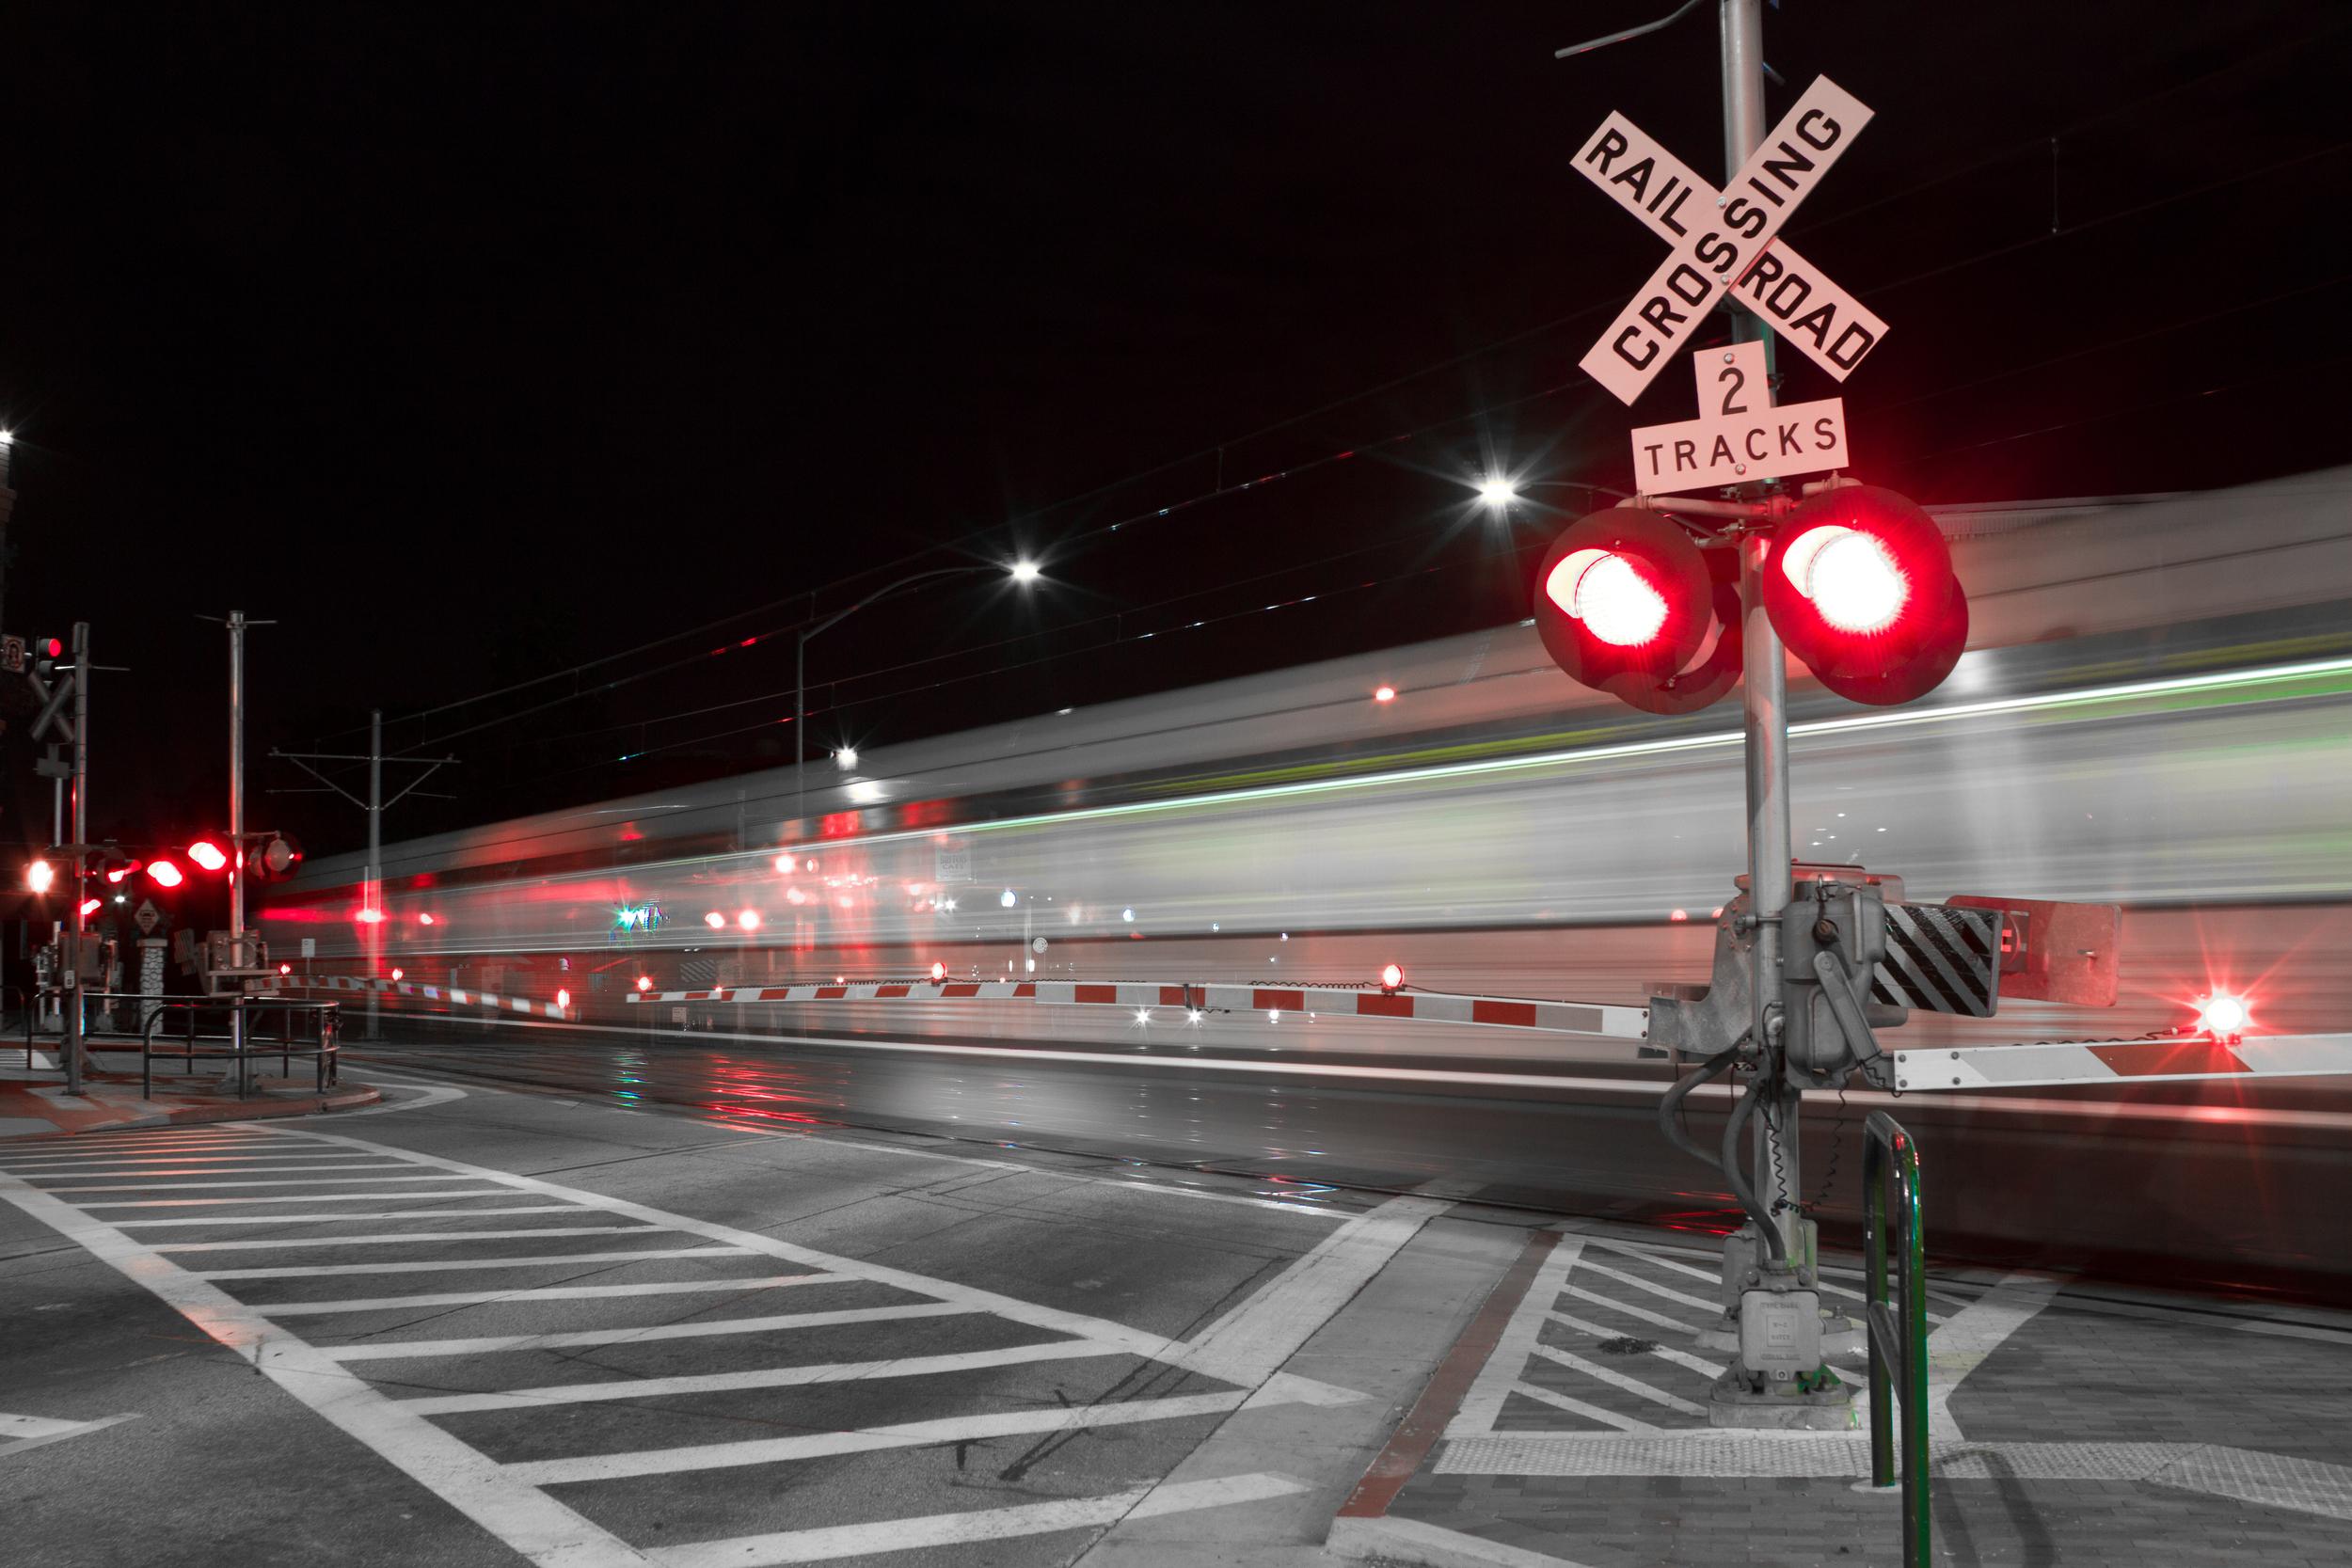 South Pasadena Metro Rollie Robles.jpg